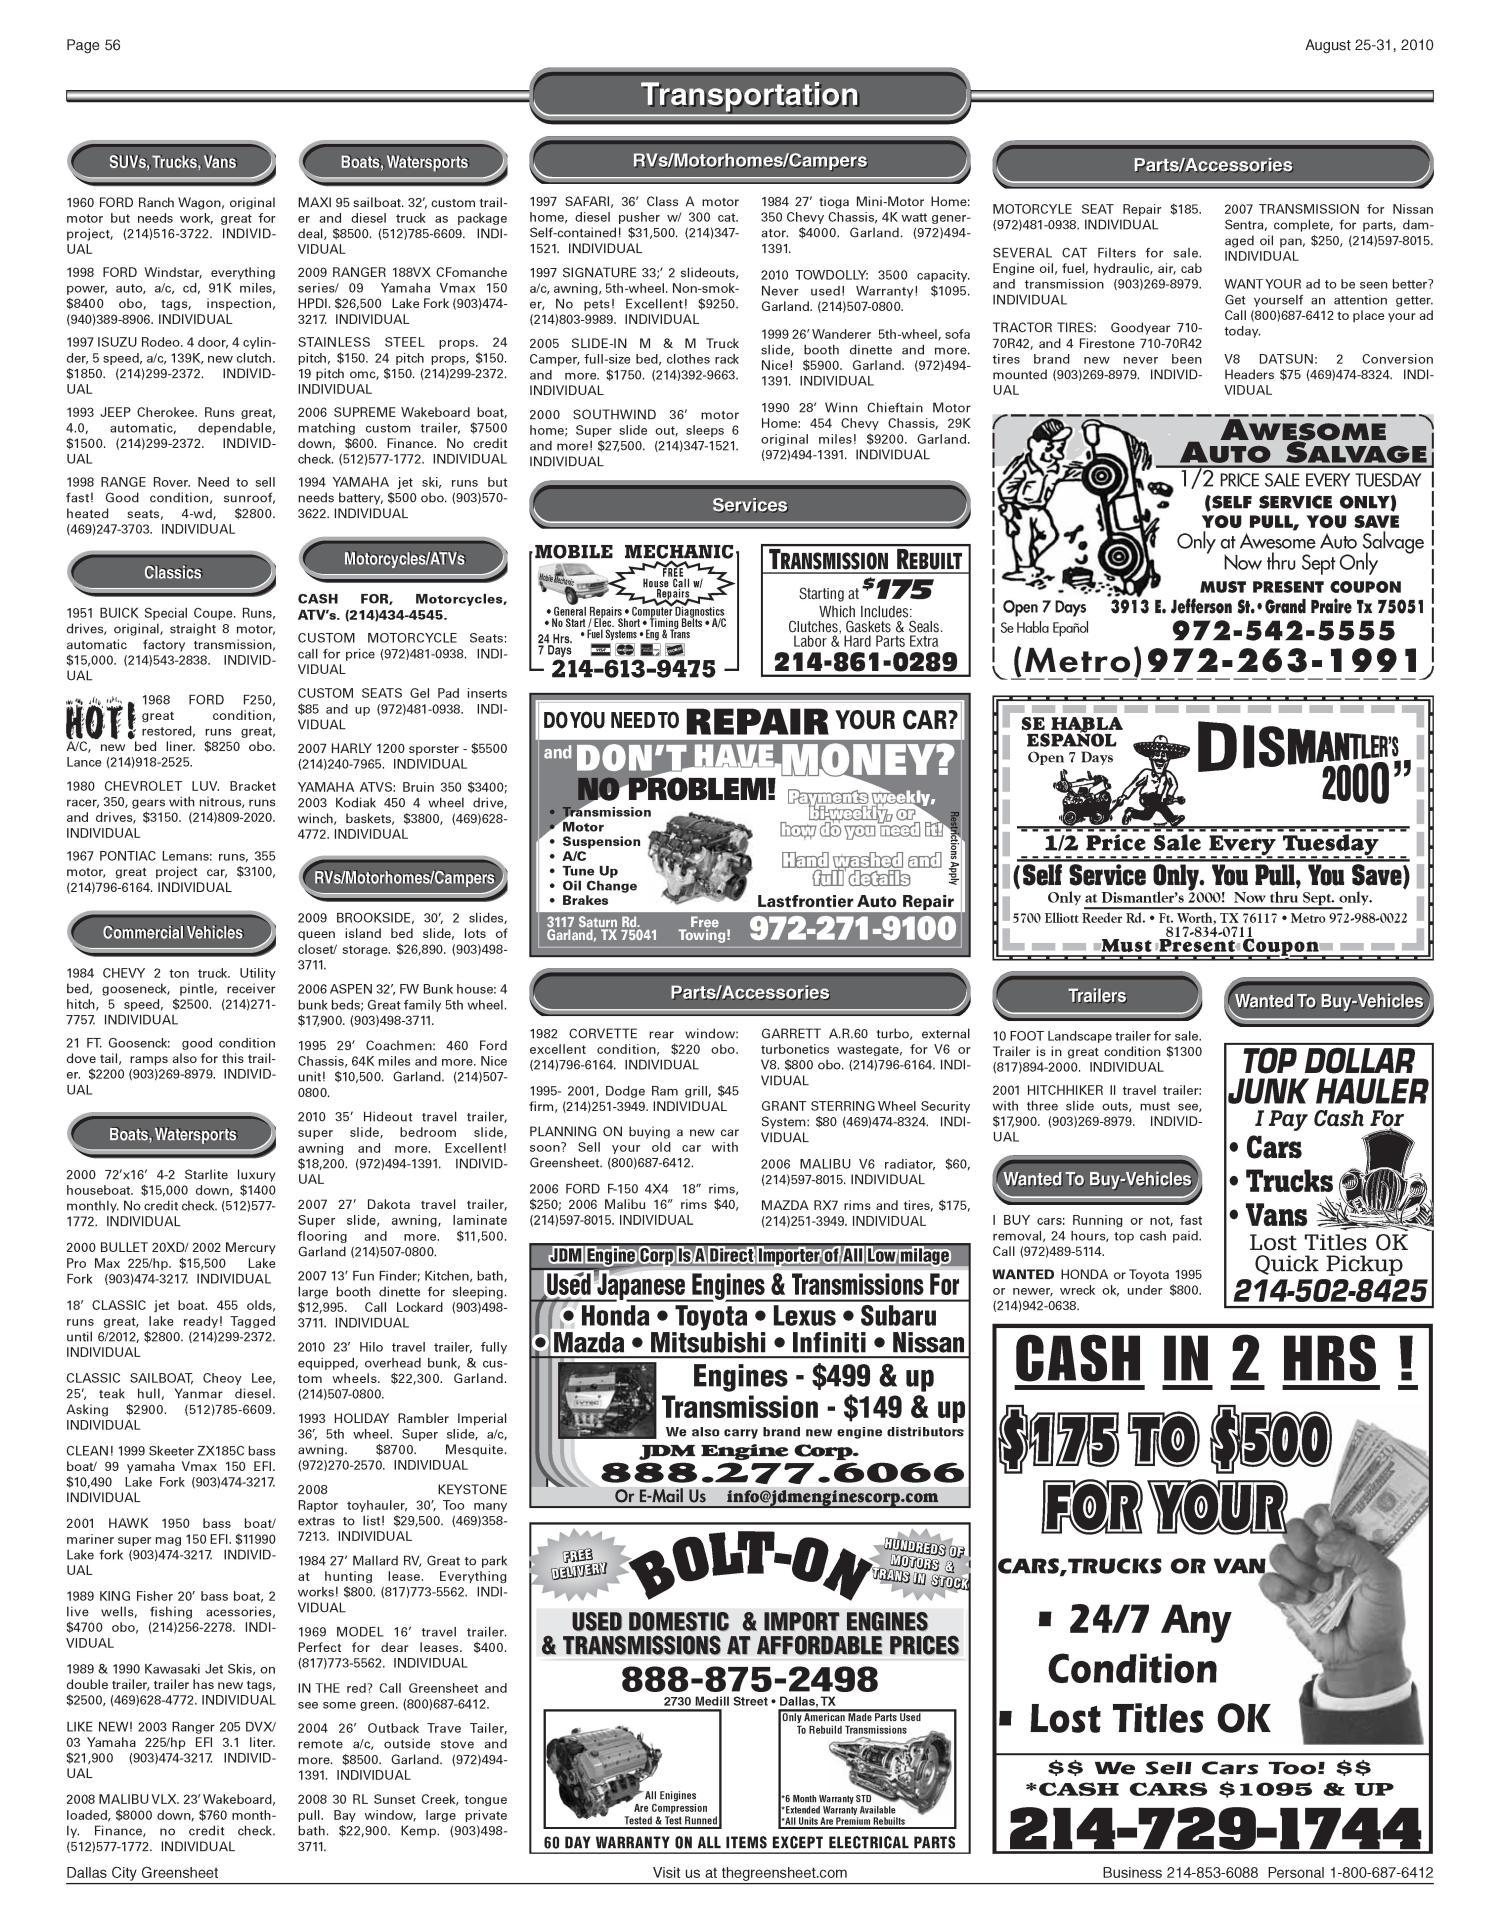 The Greensheet (Dallas, Tex ), Vol  34, No  141, Ed  1 Wednesday